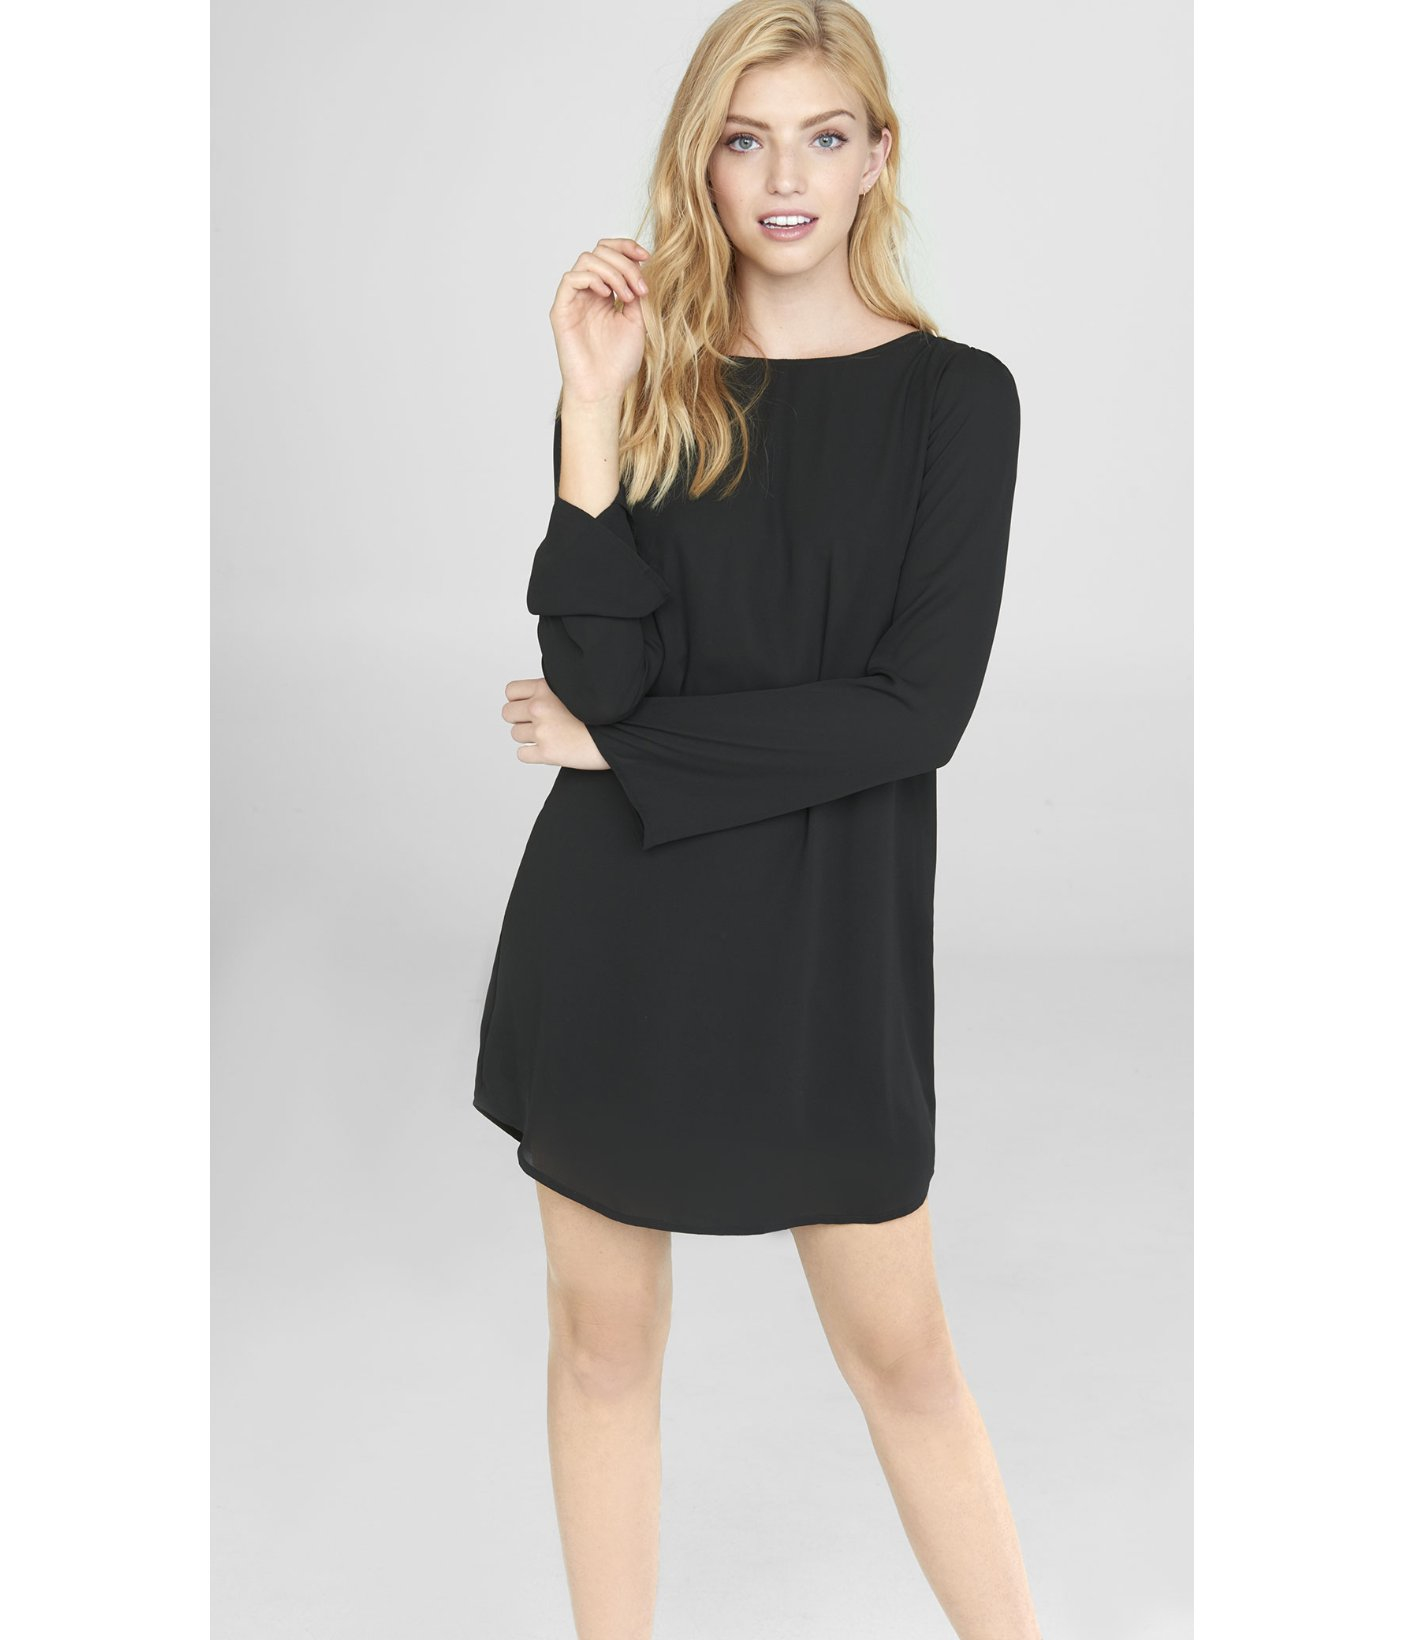 Express Black Fringe Back Tunic Dress in Black | Lyst